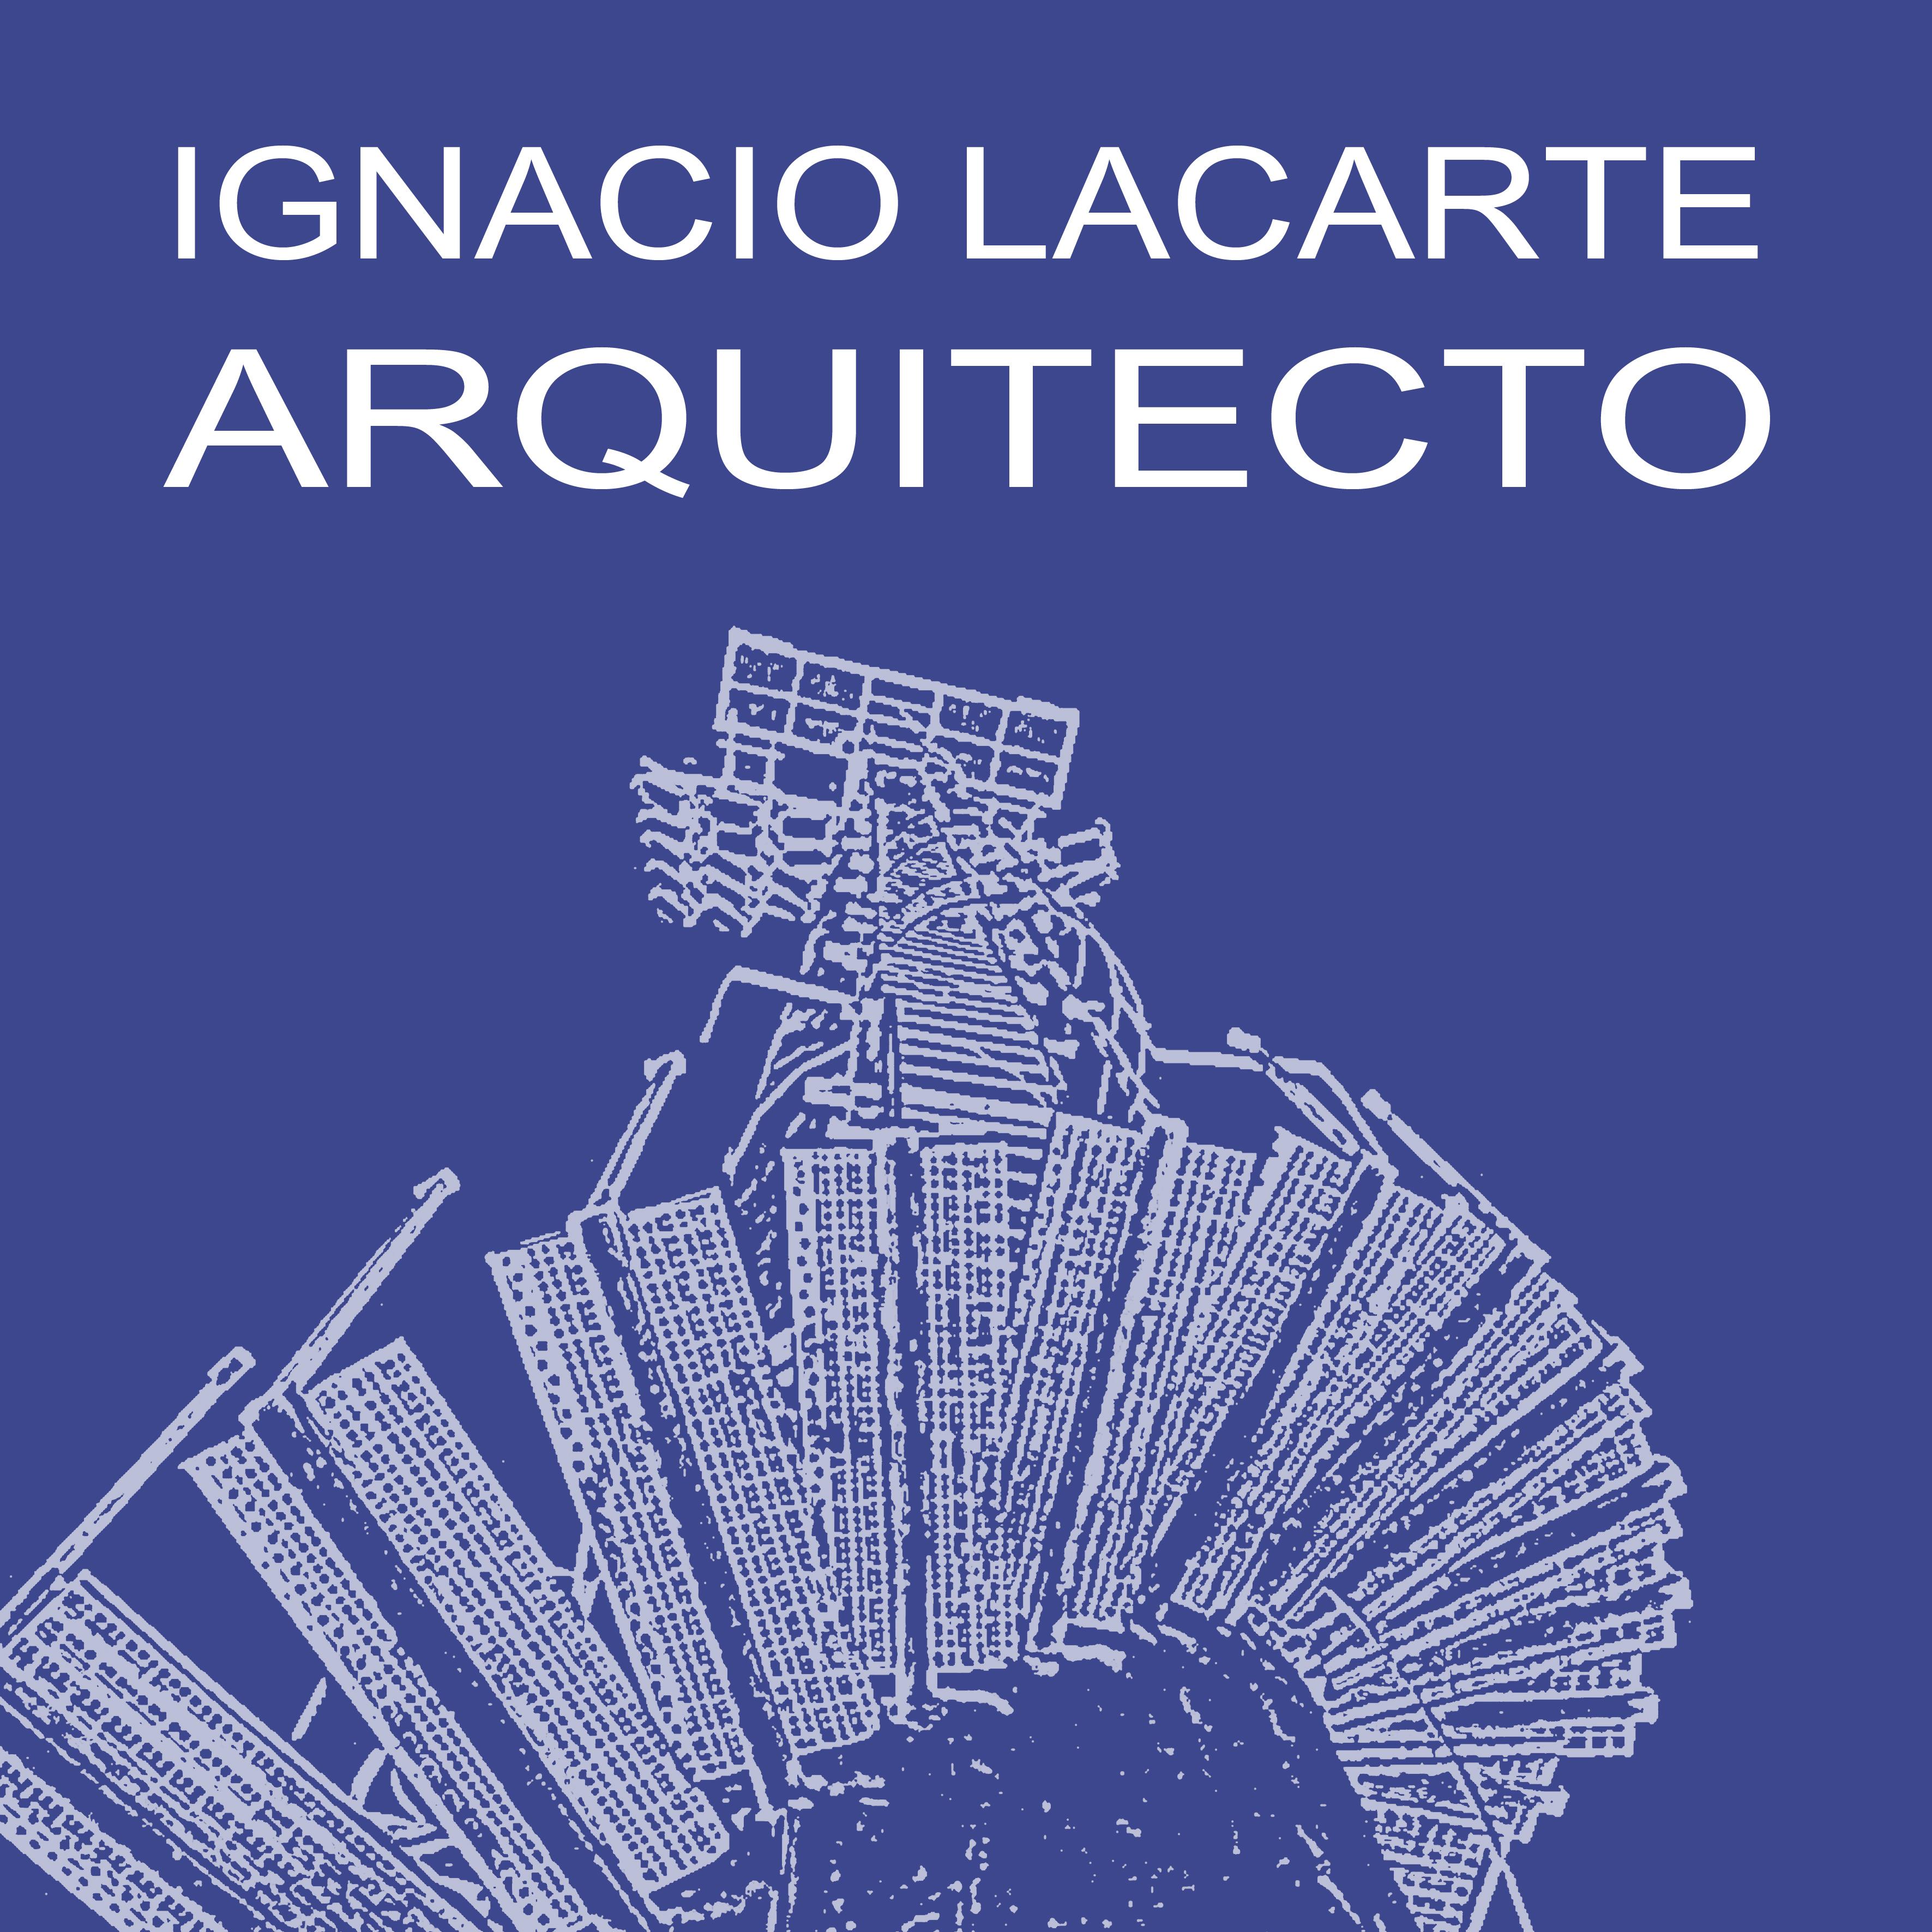 IGNACIO LACARTE ARQUITECTOS